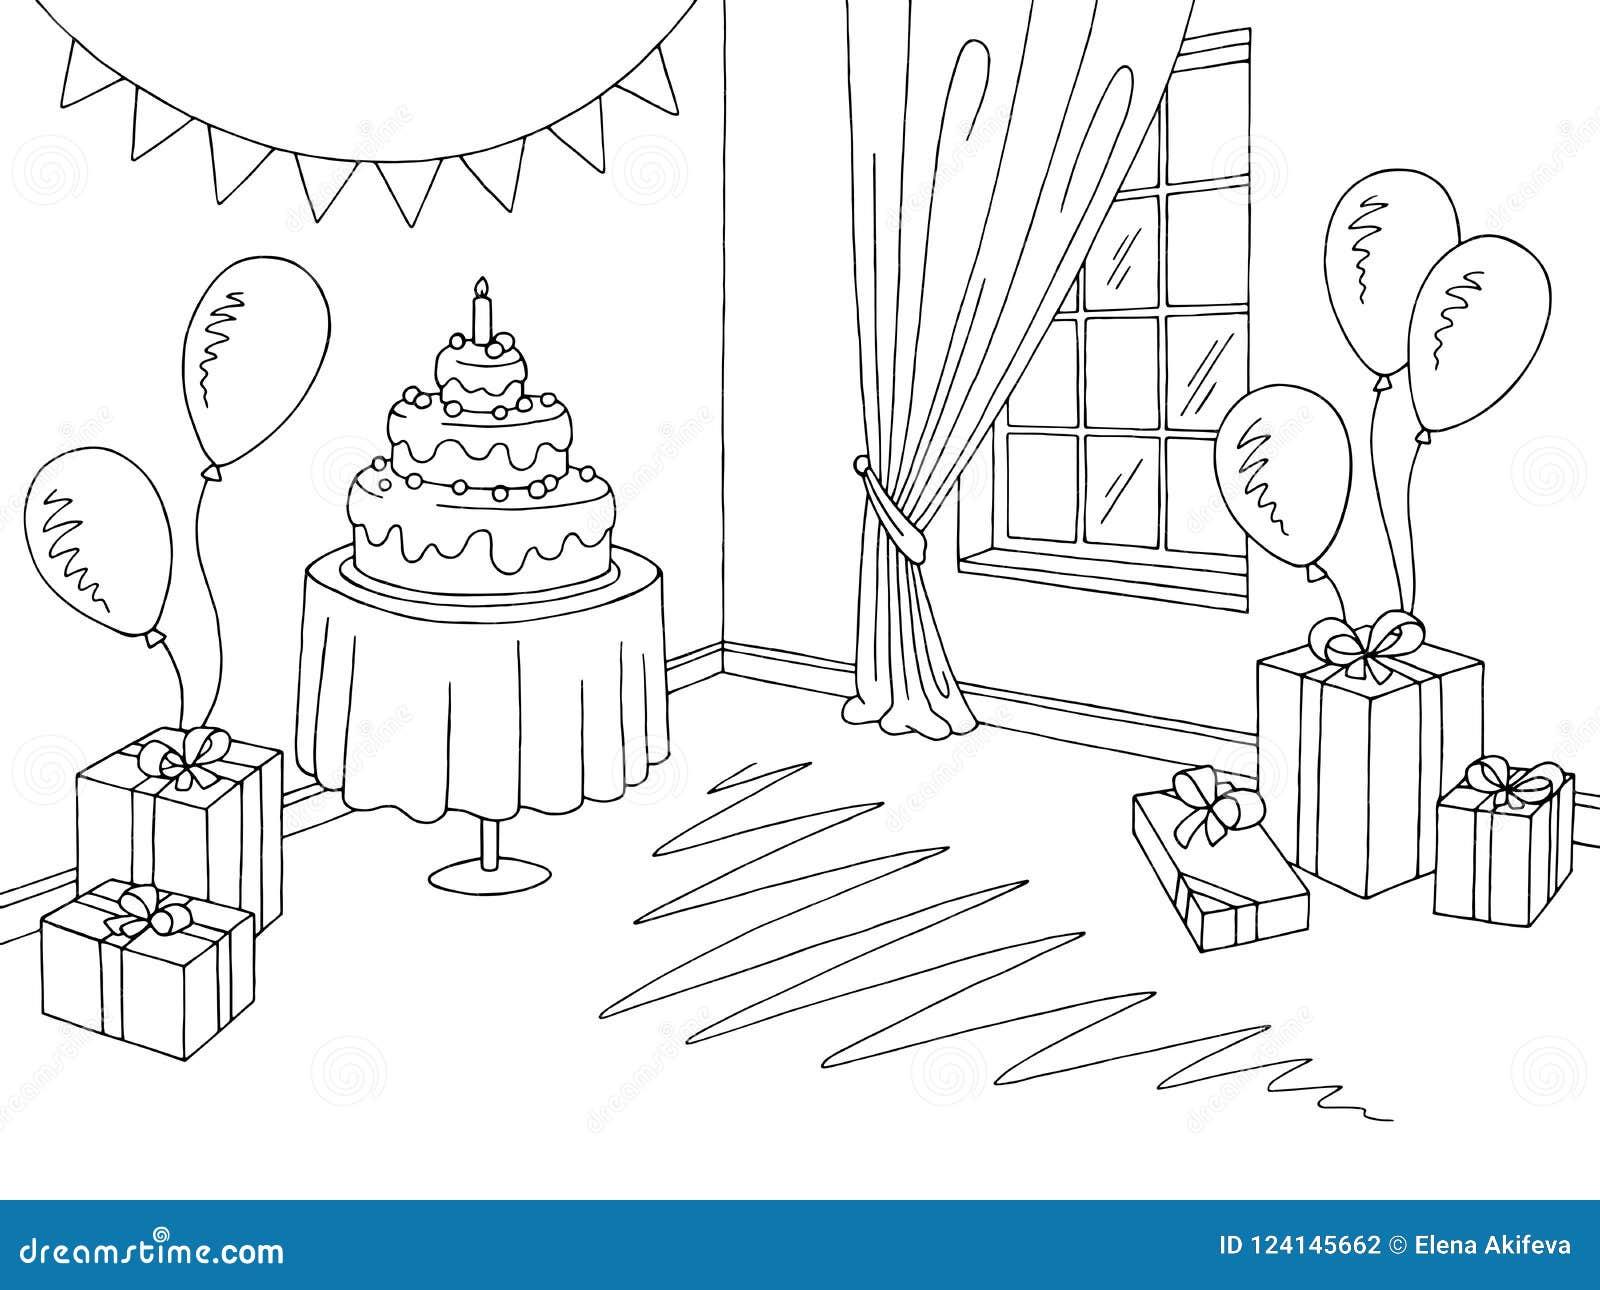 Children Party Room Graphic Black White Home Interior Sketch